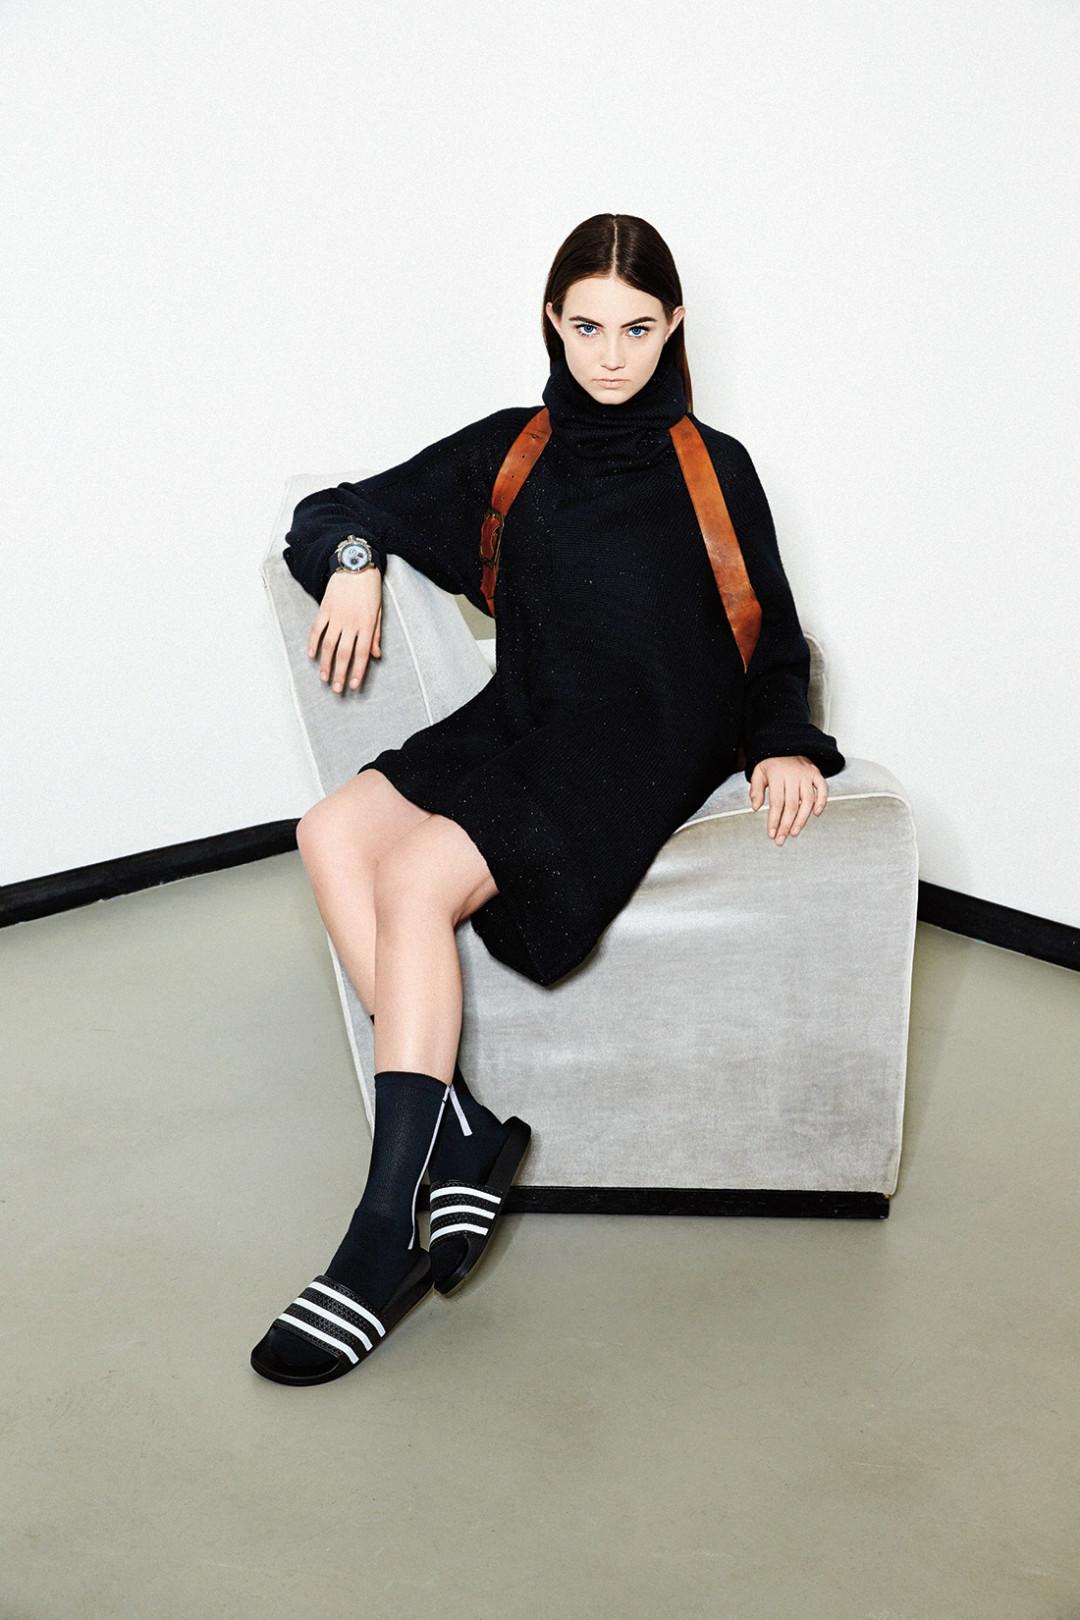 0215 plain spoken black dress wfhbup